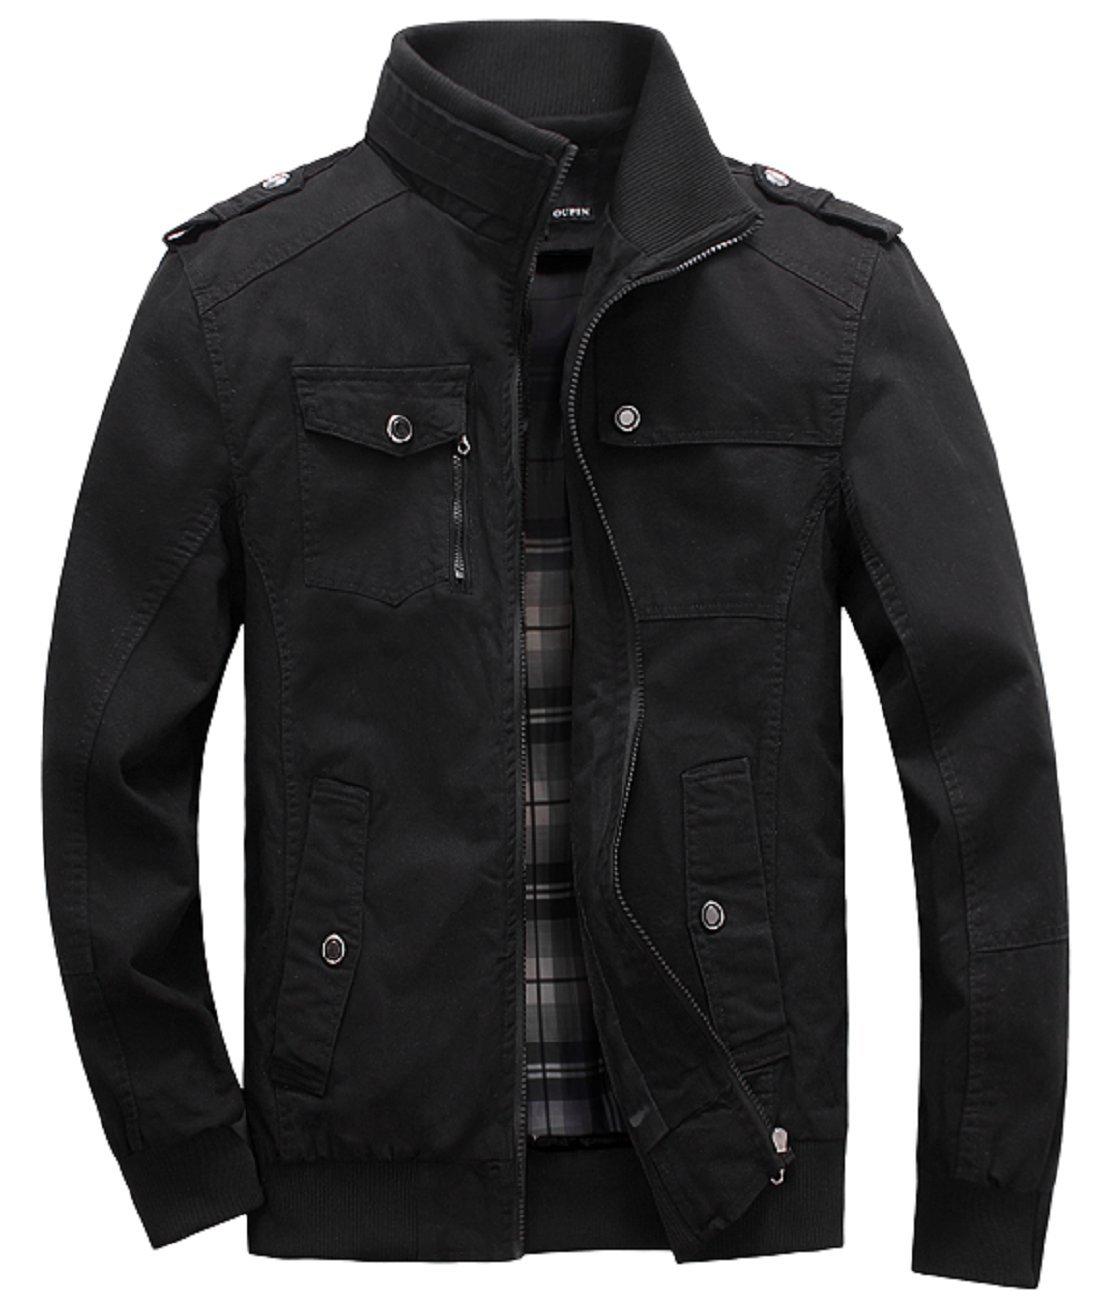 Lejckea Men's Muti-Pockets Cotton Stand Collar Jackets and Coats(L Size,Black) by Lejckea